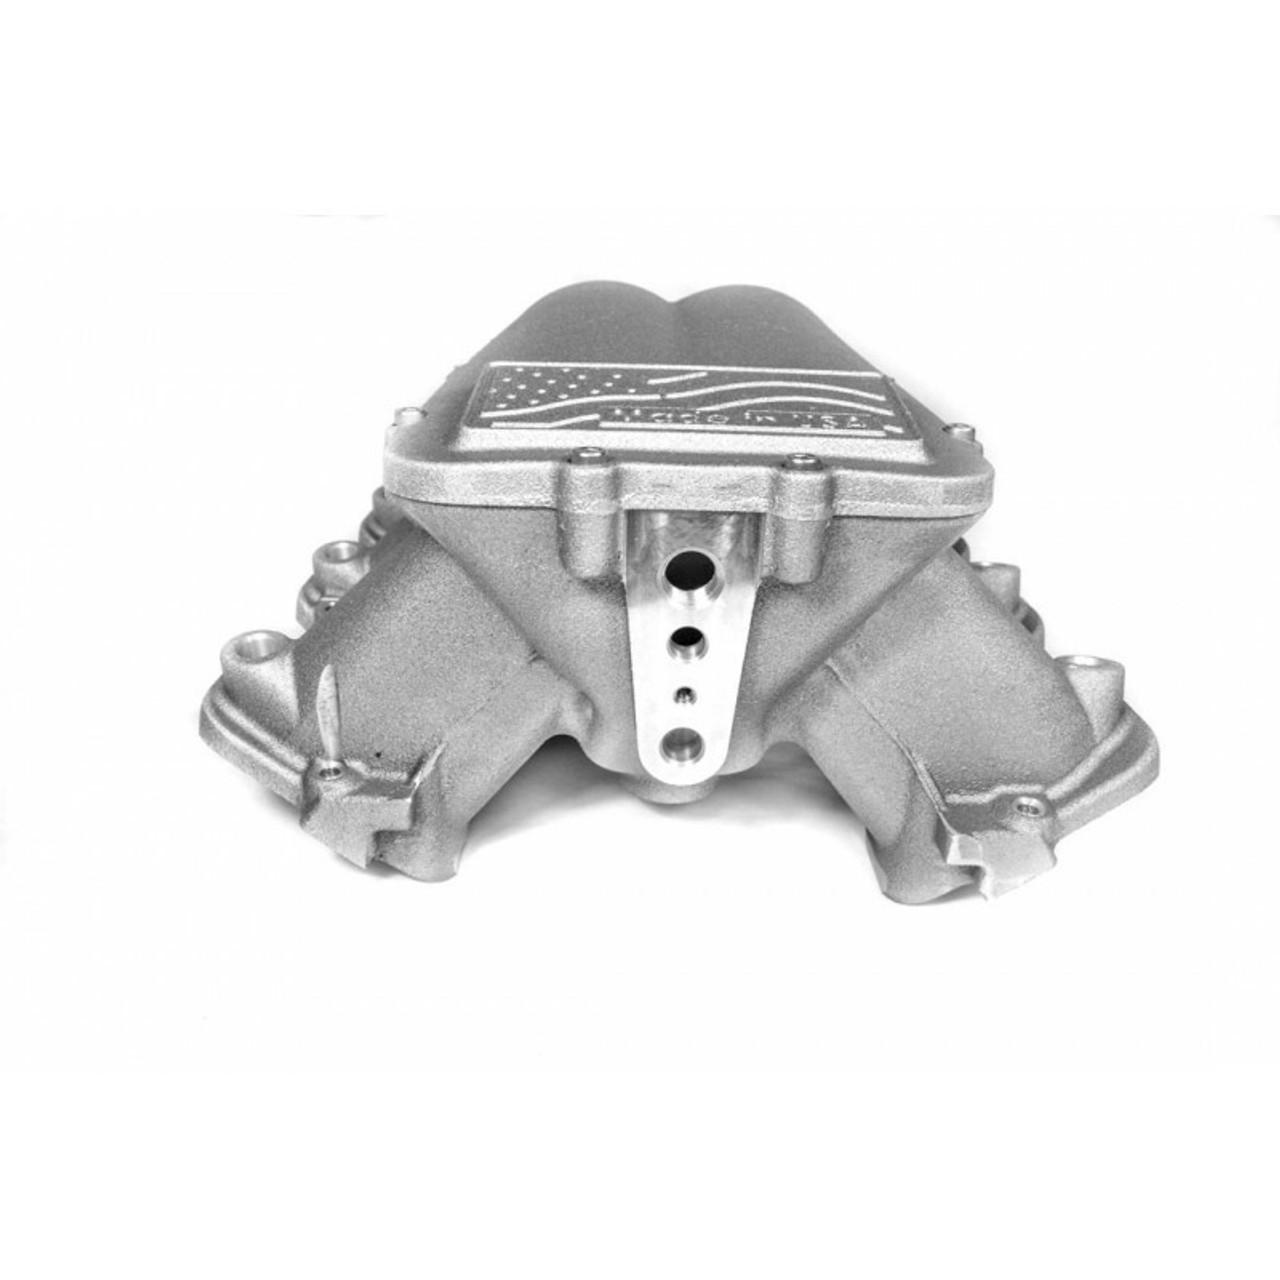 BTR Equalizer 1 Intake Manifold - Cathedral Head Brian Tooley IMA-01 LS1 LS2 LS6 4.8 5.3 5.7 6.0